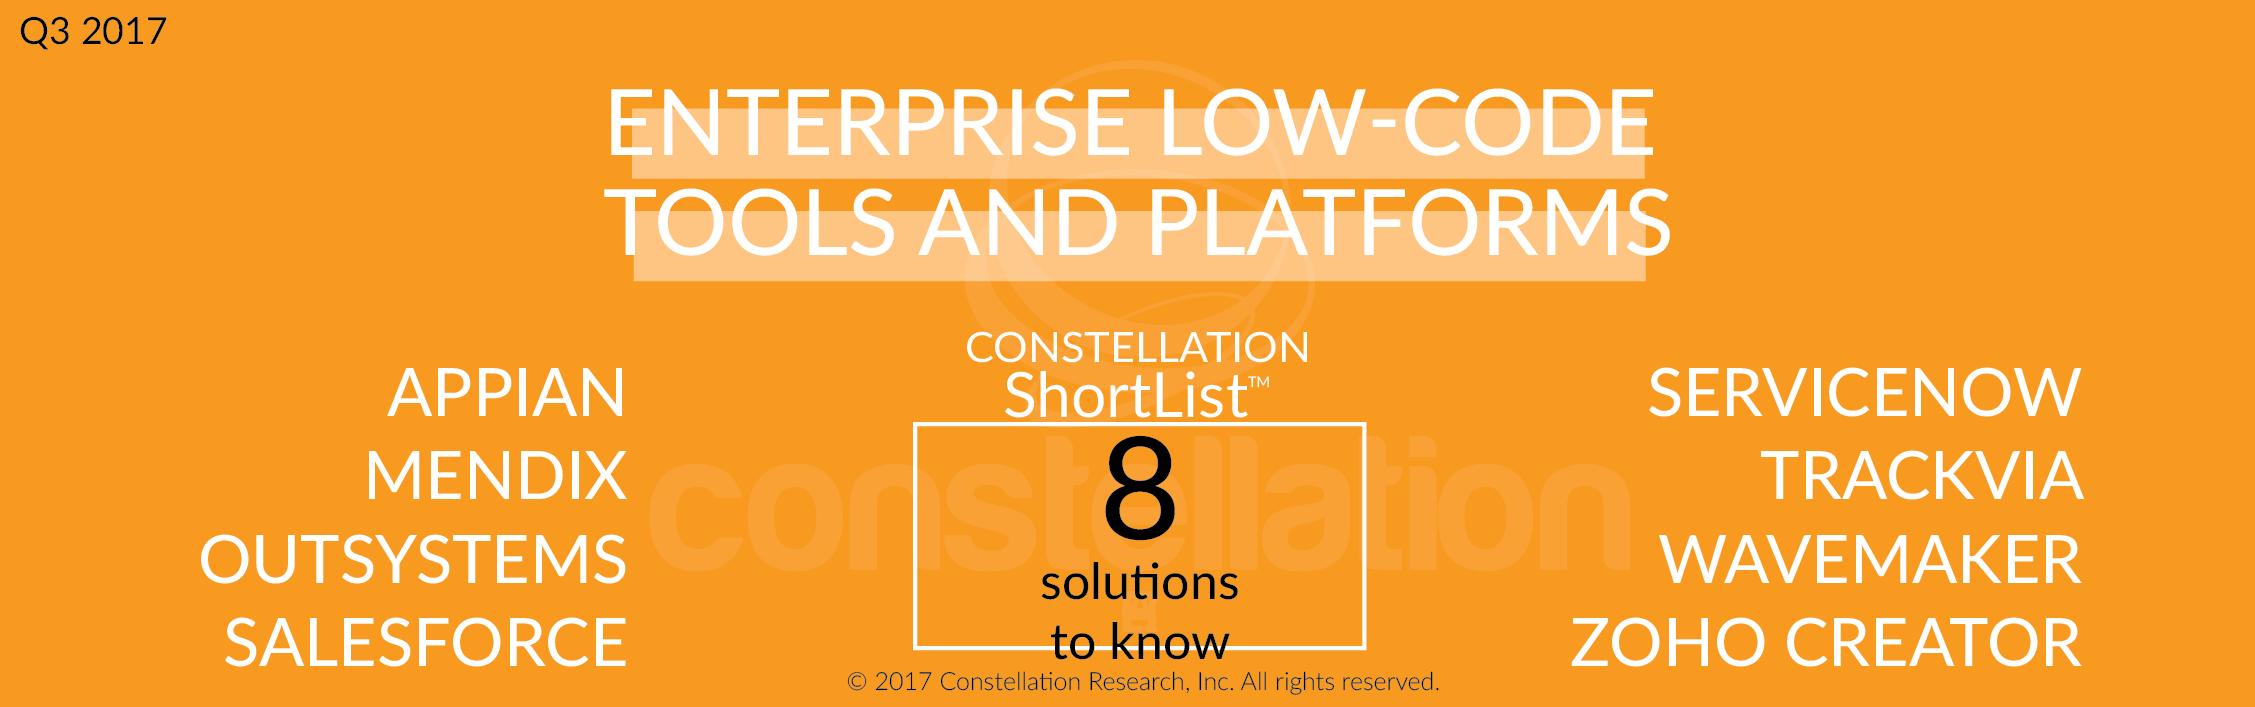 Constellation ShortList Enterprise Low-Code Tools and Platforms